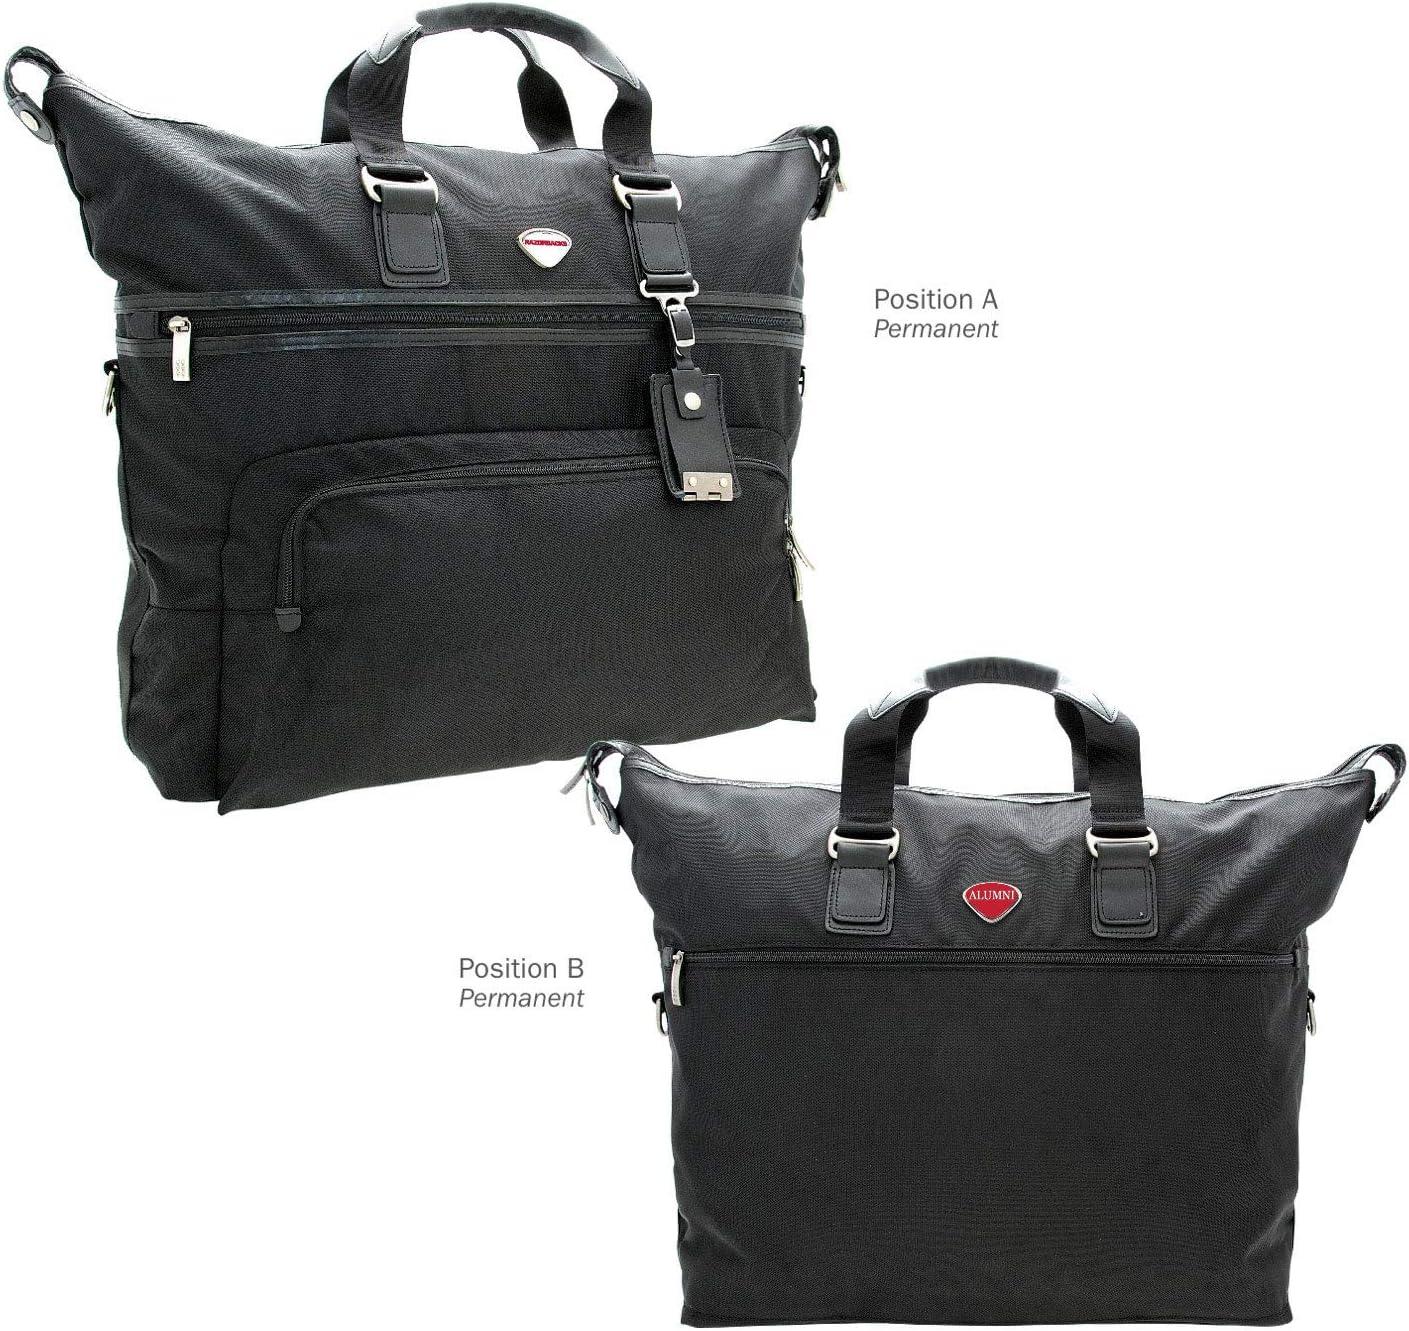 AdSpec NCAA Arkansas Razorbacks Collegiate Executive Weekender Duffel BagCollegiate Executive Weekender Duffel Bag One Size Black